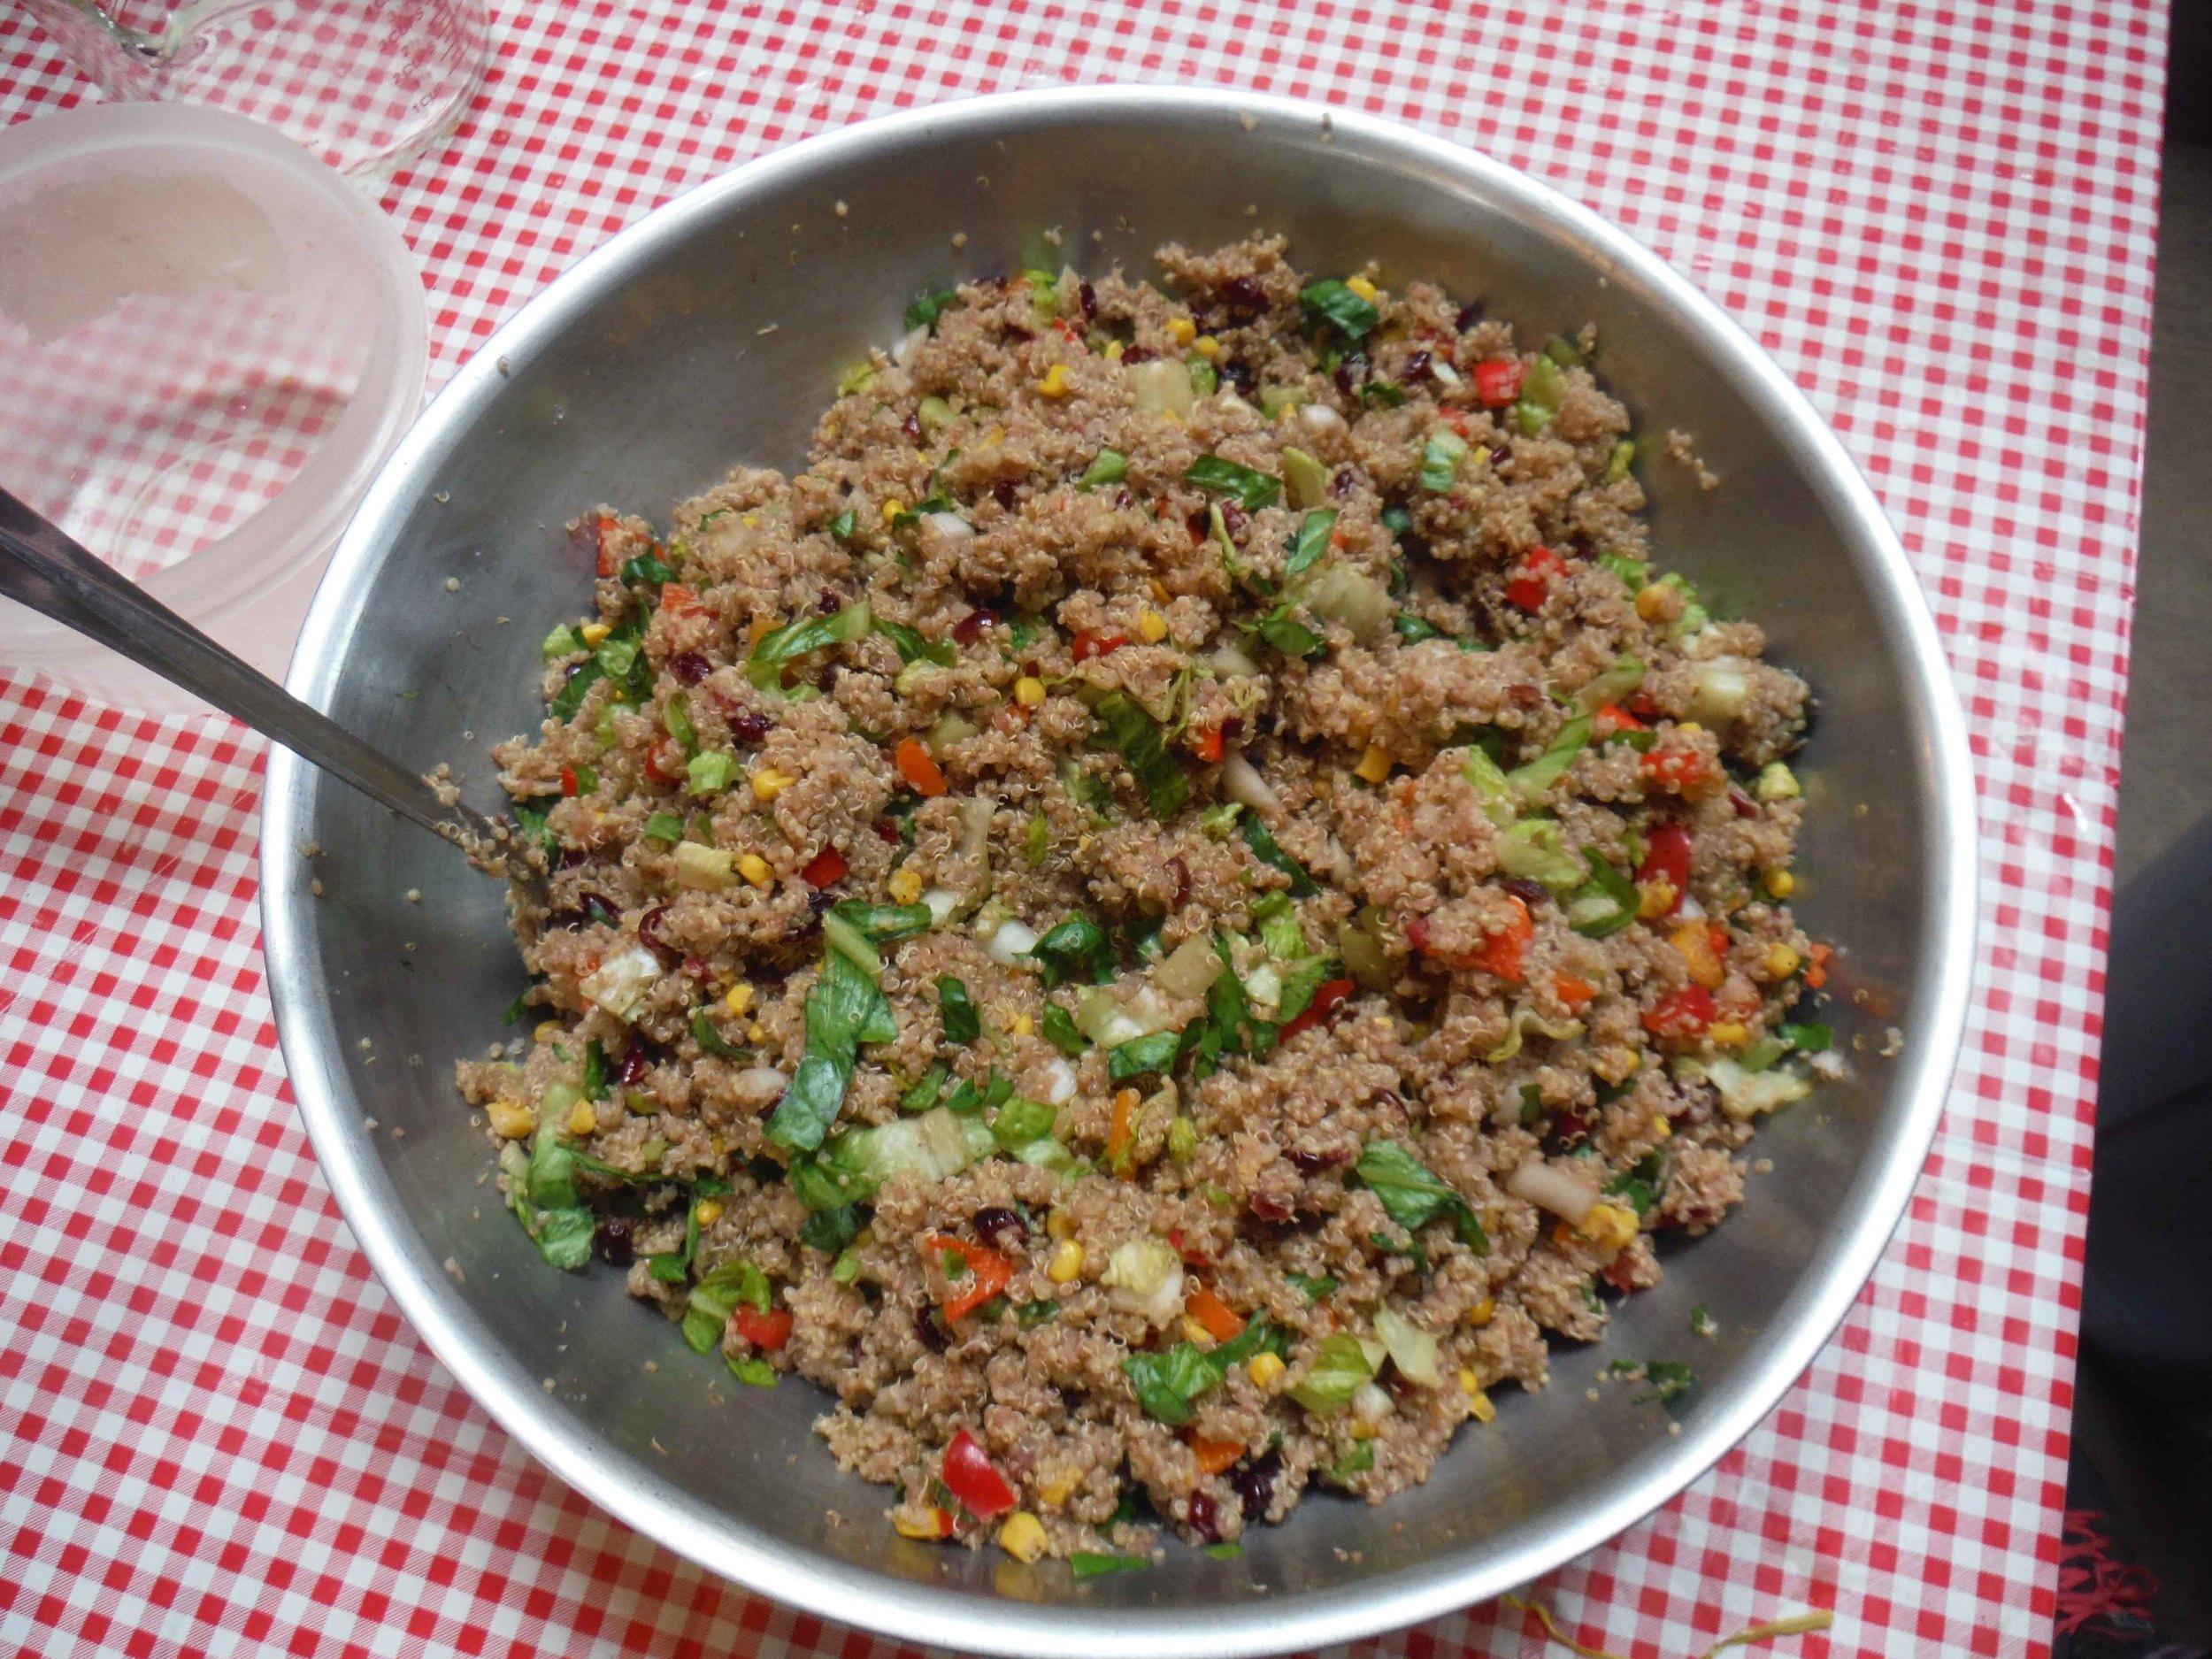 A side of quinoa salad. Photo by Sarah Bouckoms